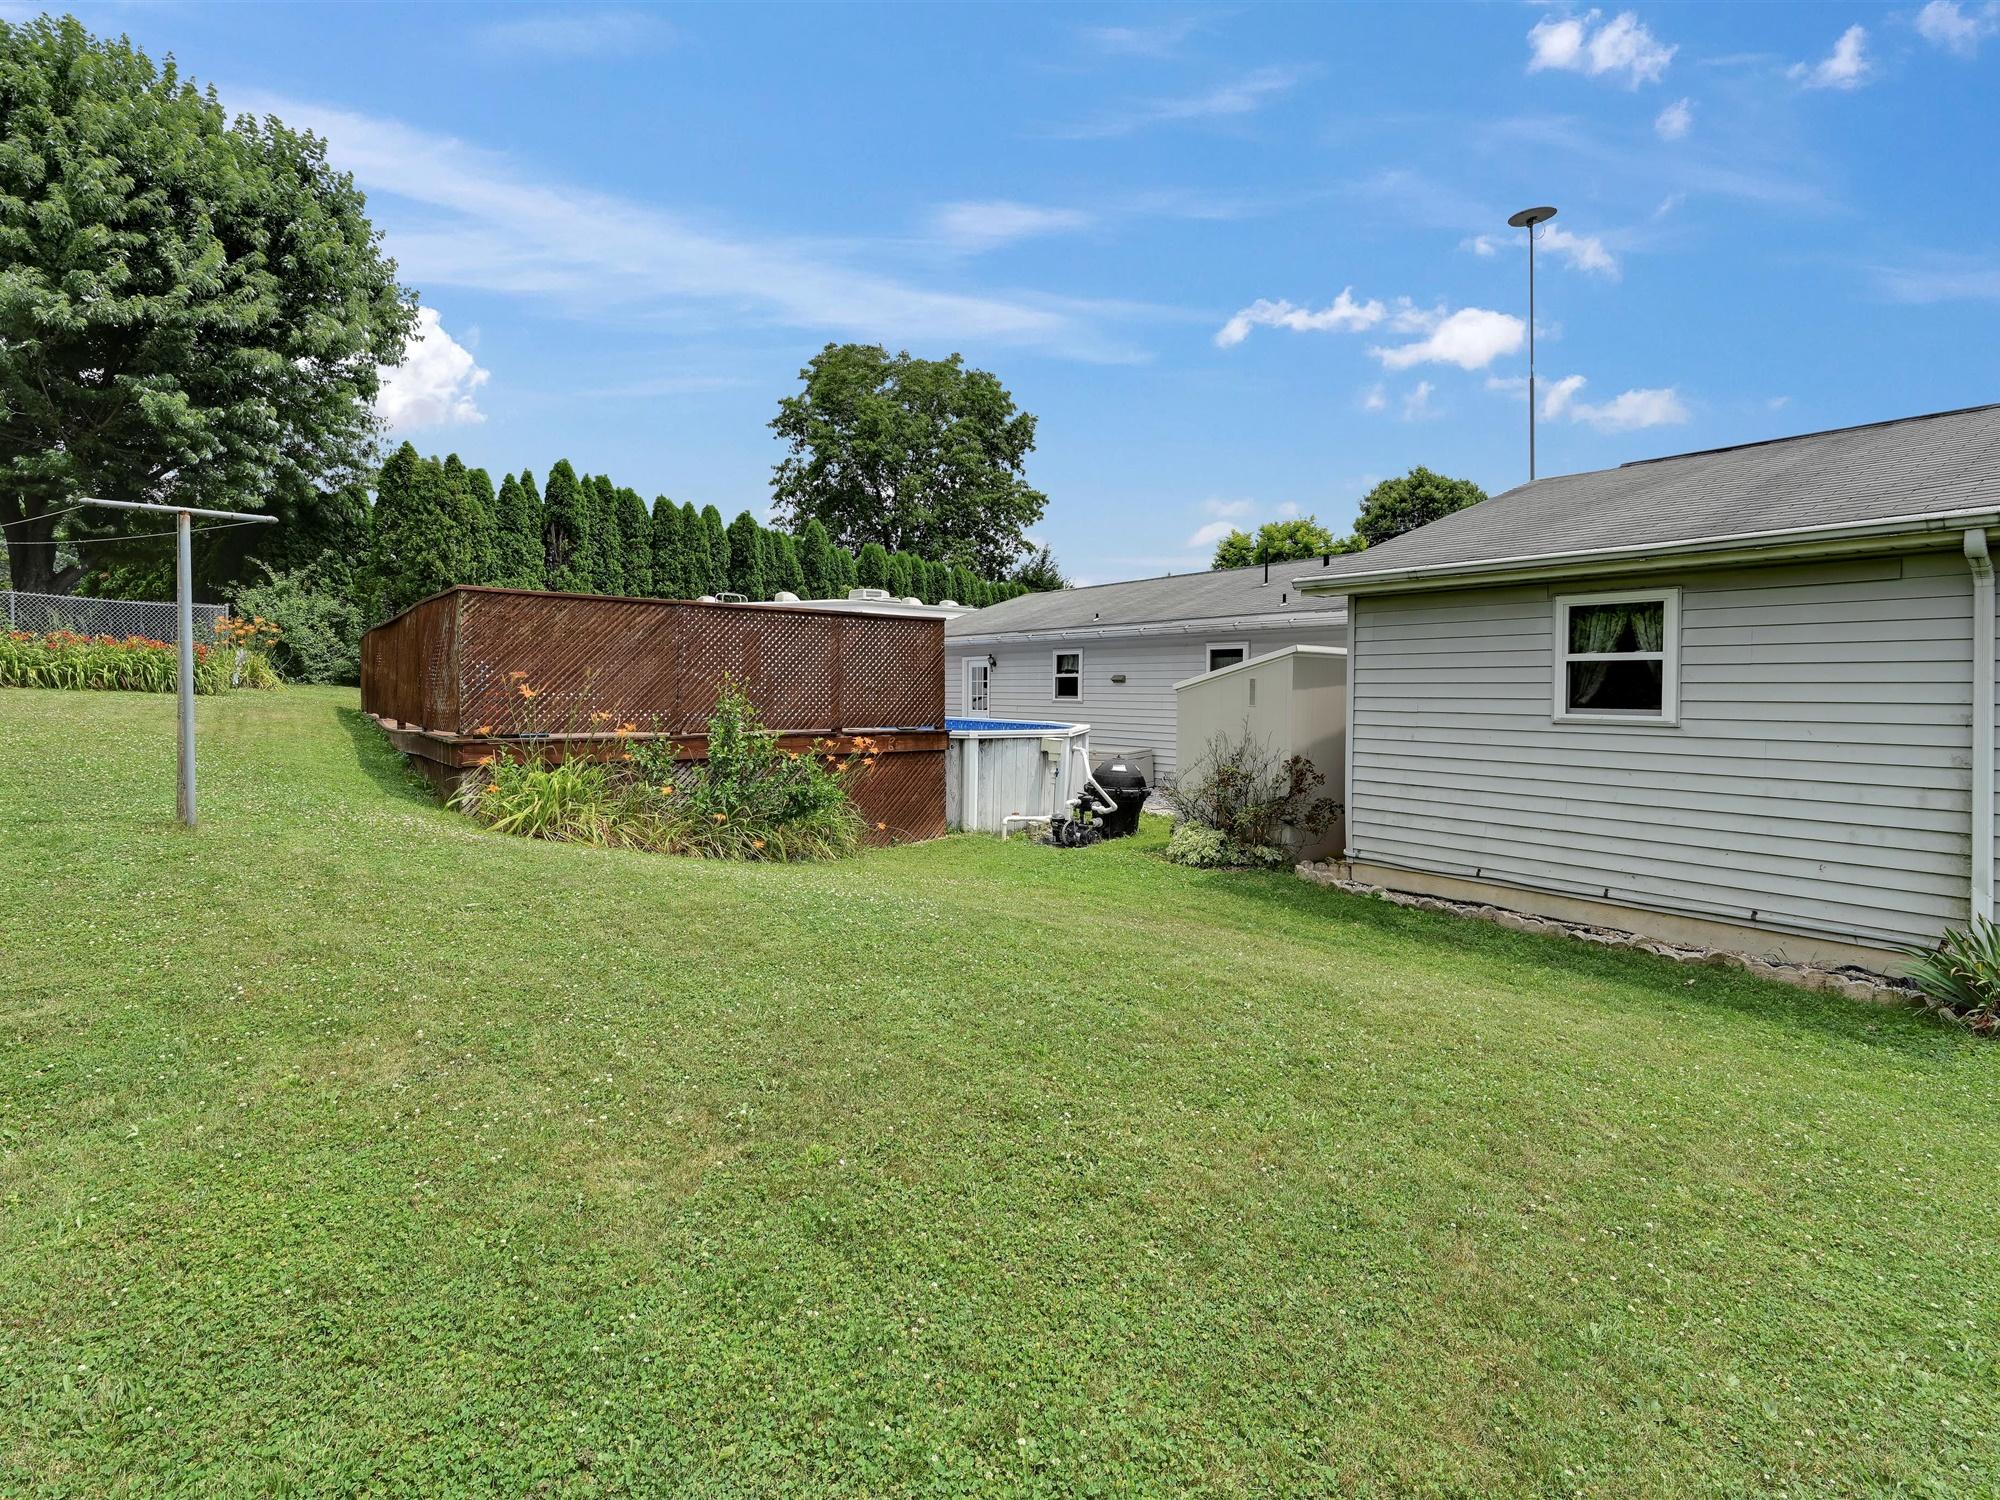 1617 Greenwood Dr. - side yard